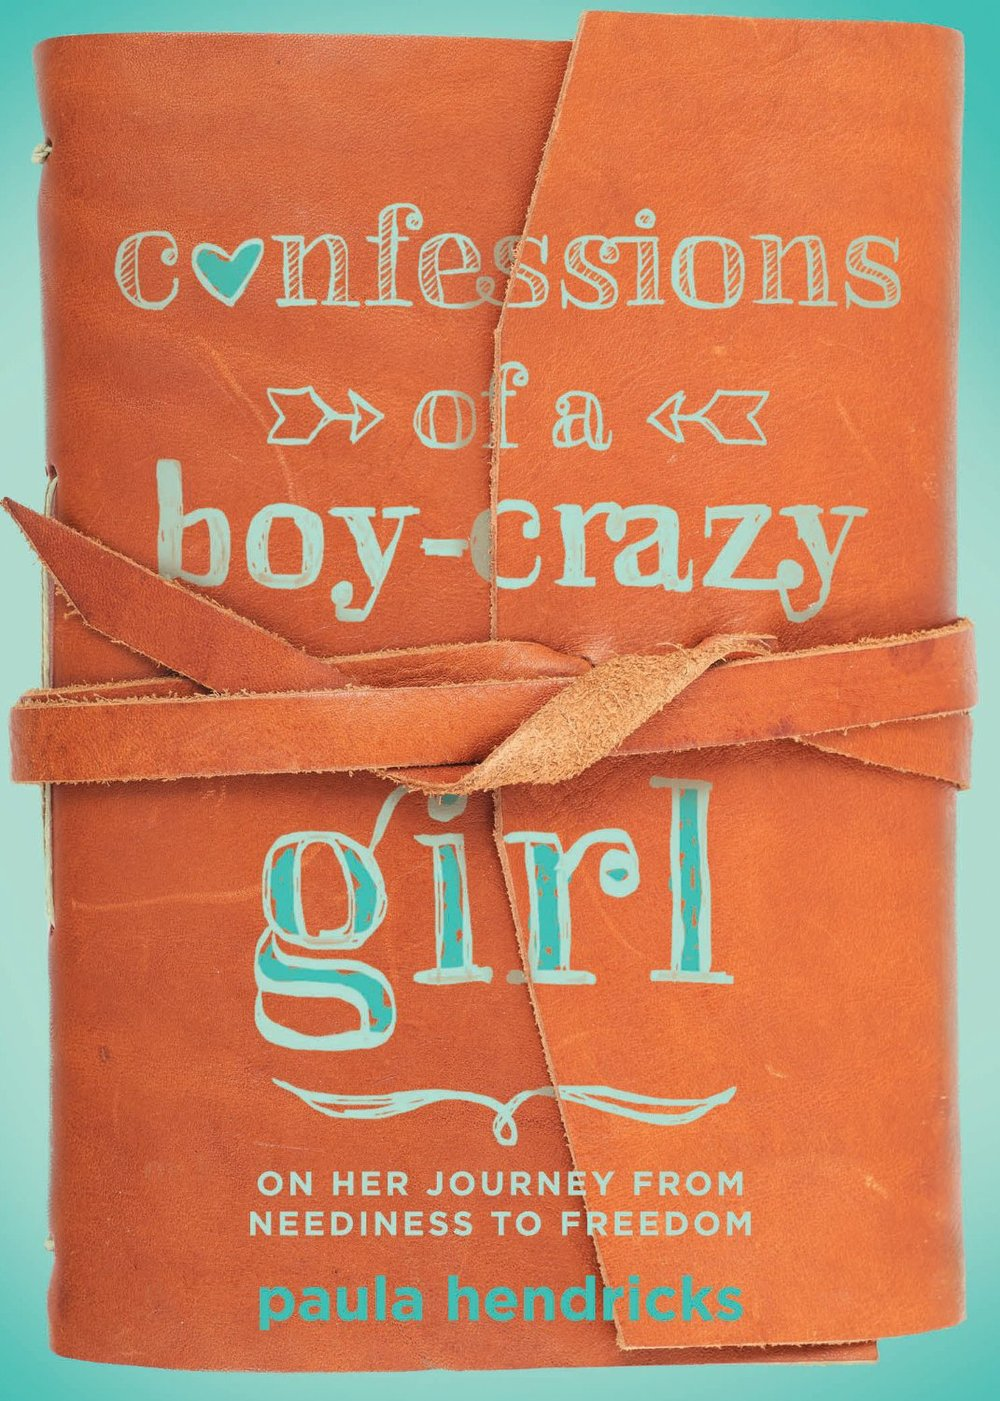 boy-crazy girl